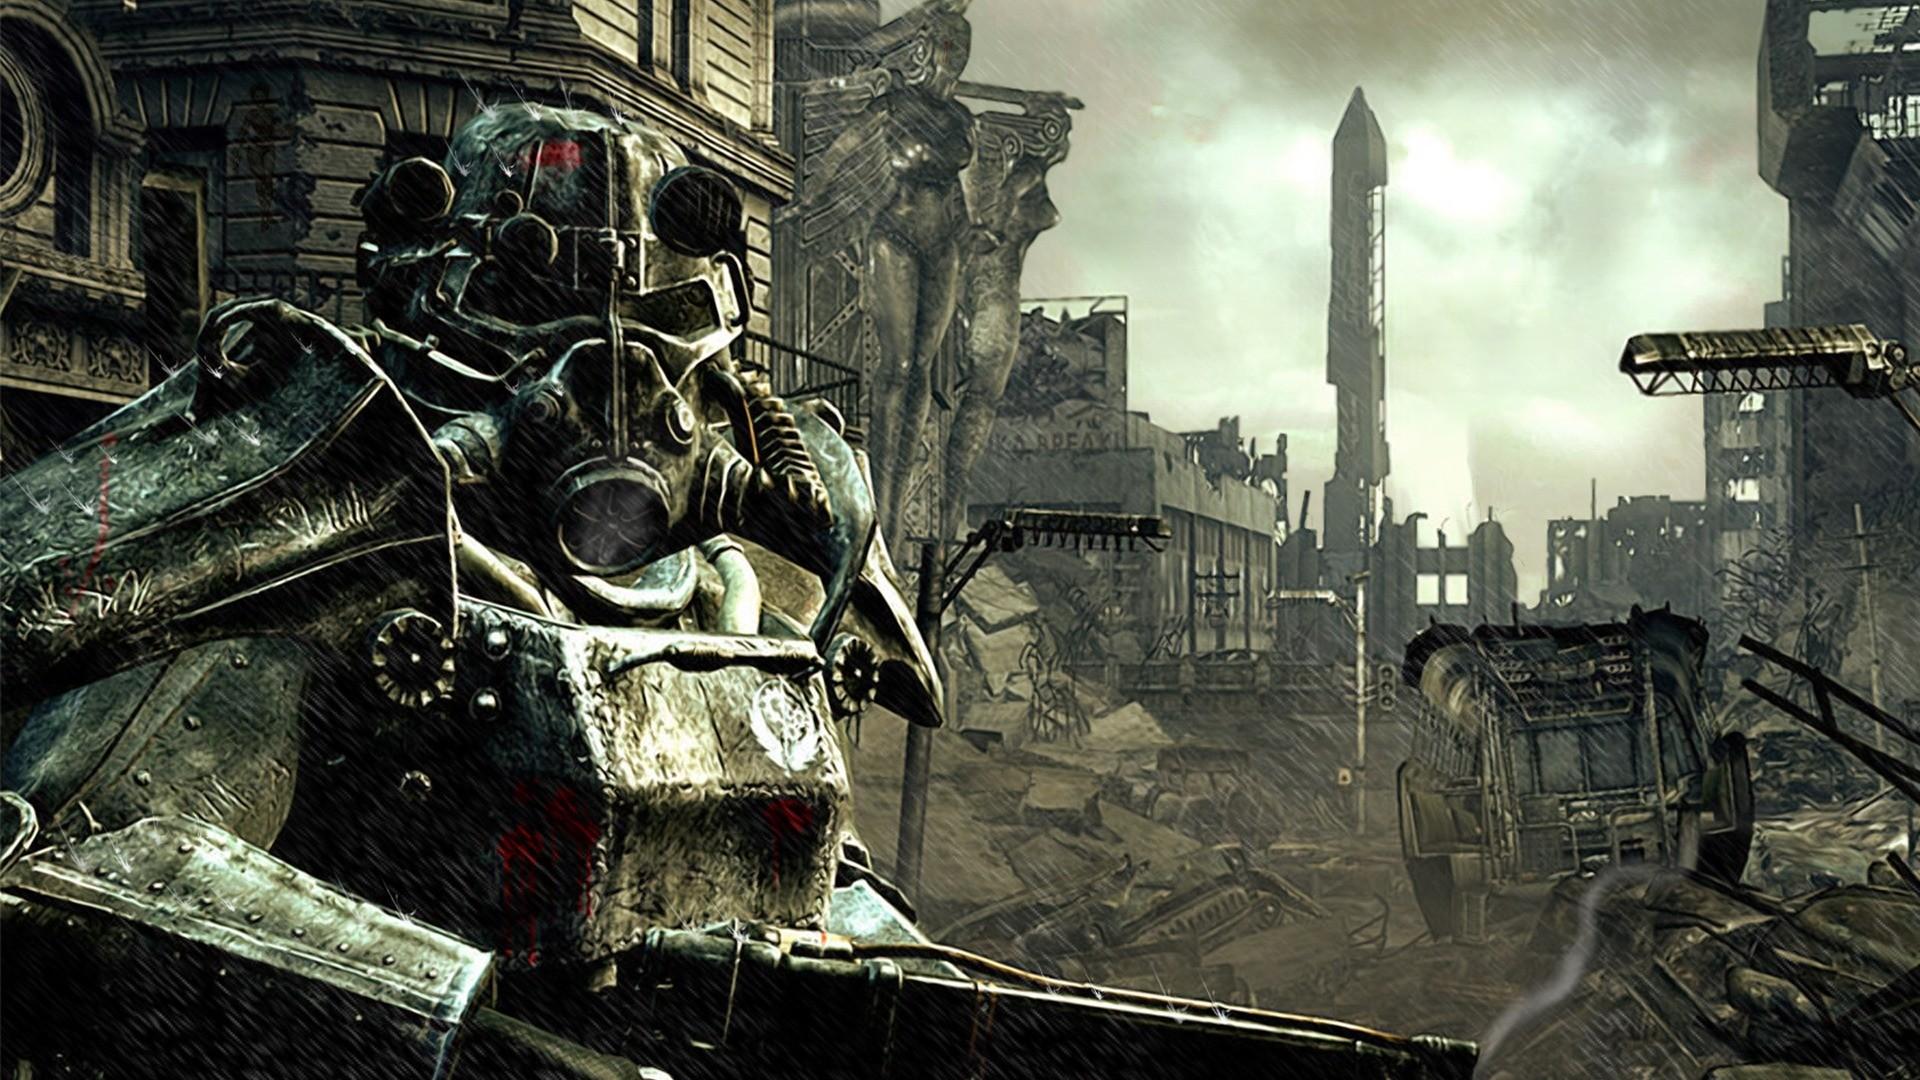 Fallout Game. Download Fallout 1 wallpaper